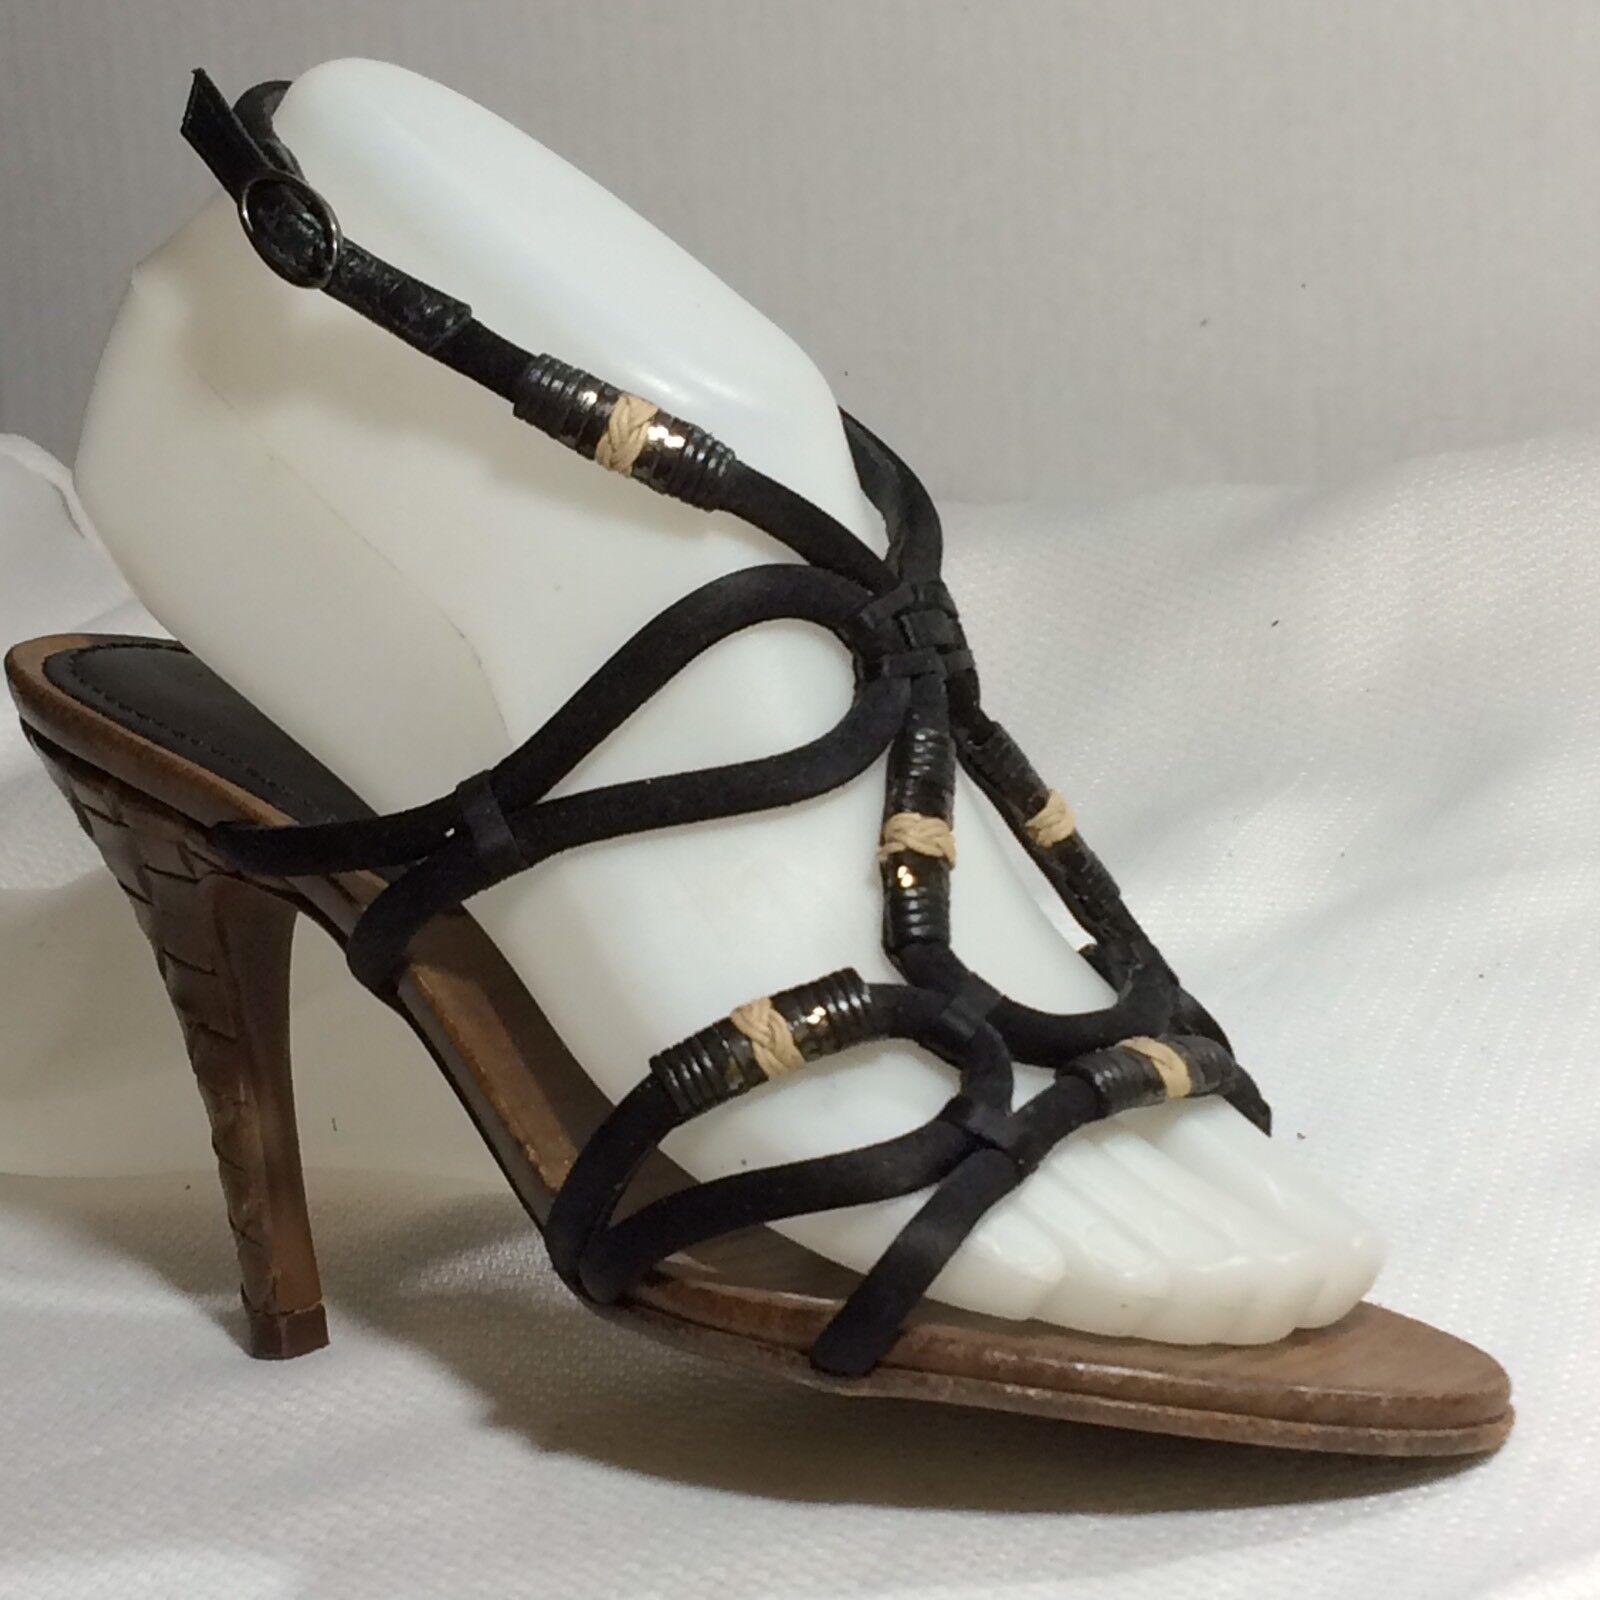 marchio famoso BOTTEGA BOTTEGA BOTTEGA VENETA Sandal nero Satin Leather Strappy Rope scarpe donna 5 M EUR 35.5  all'ingrosso a buon mercato